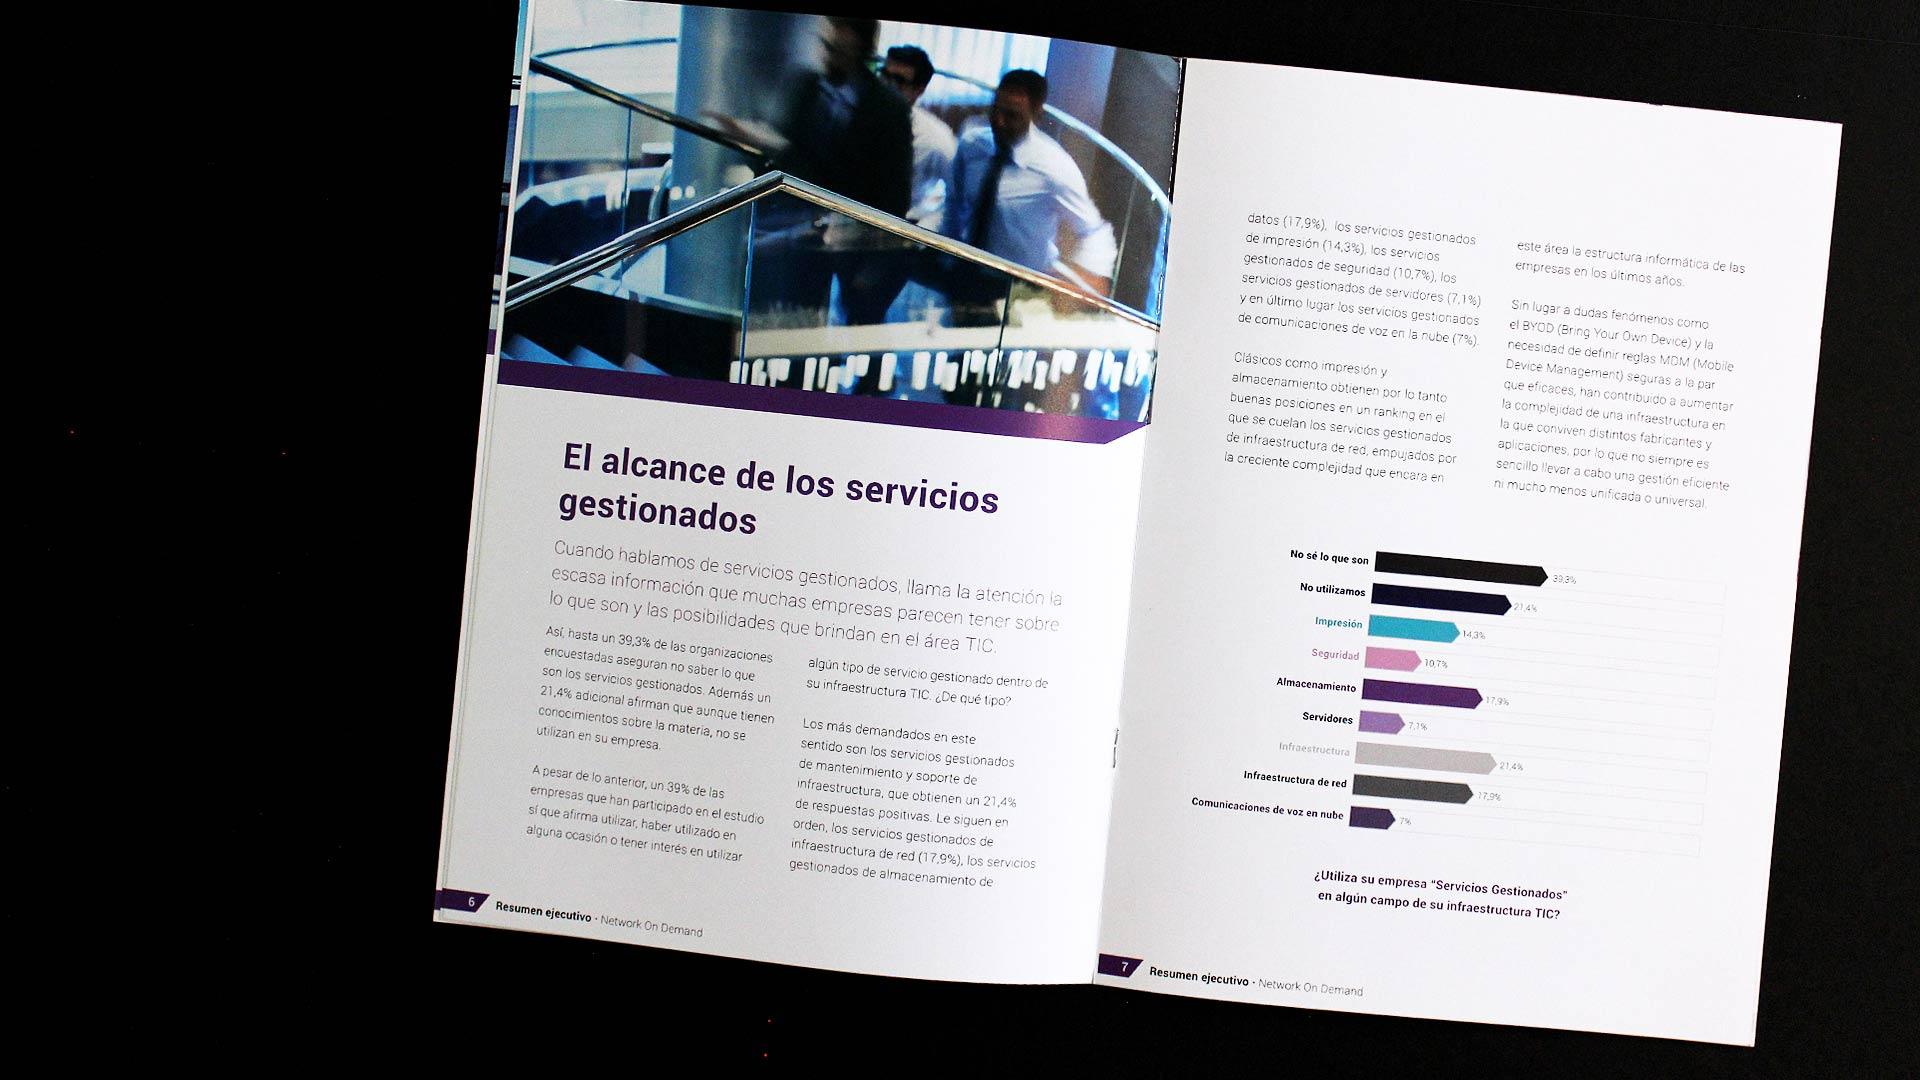 alcatel-content-marketing-informe-resumen-ejecutivo-networkondemand-ebook-2016-05